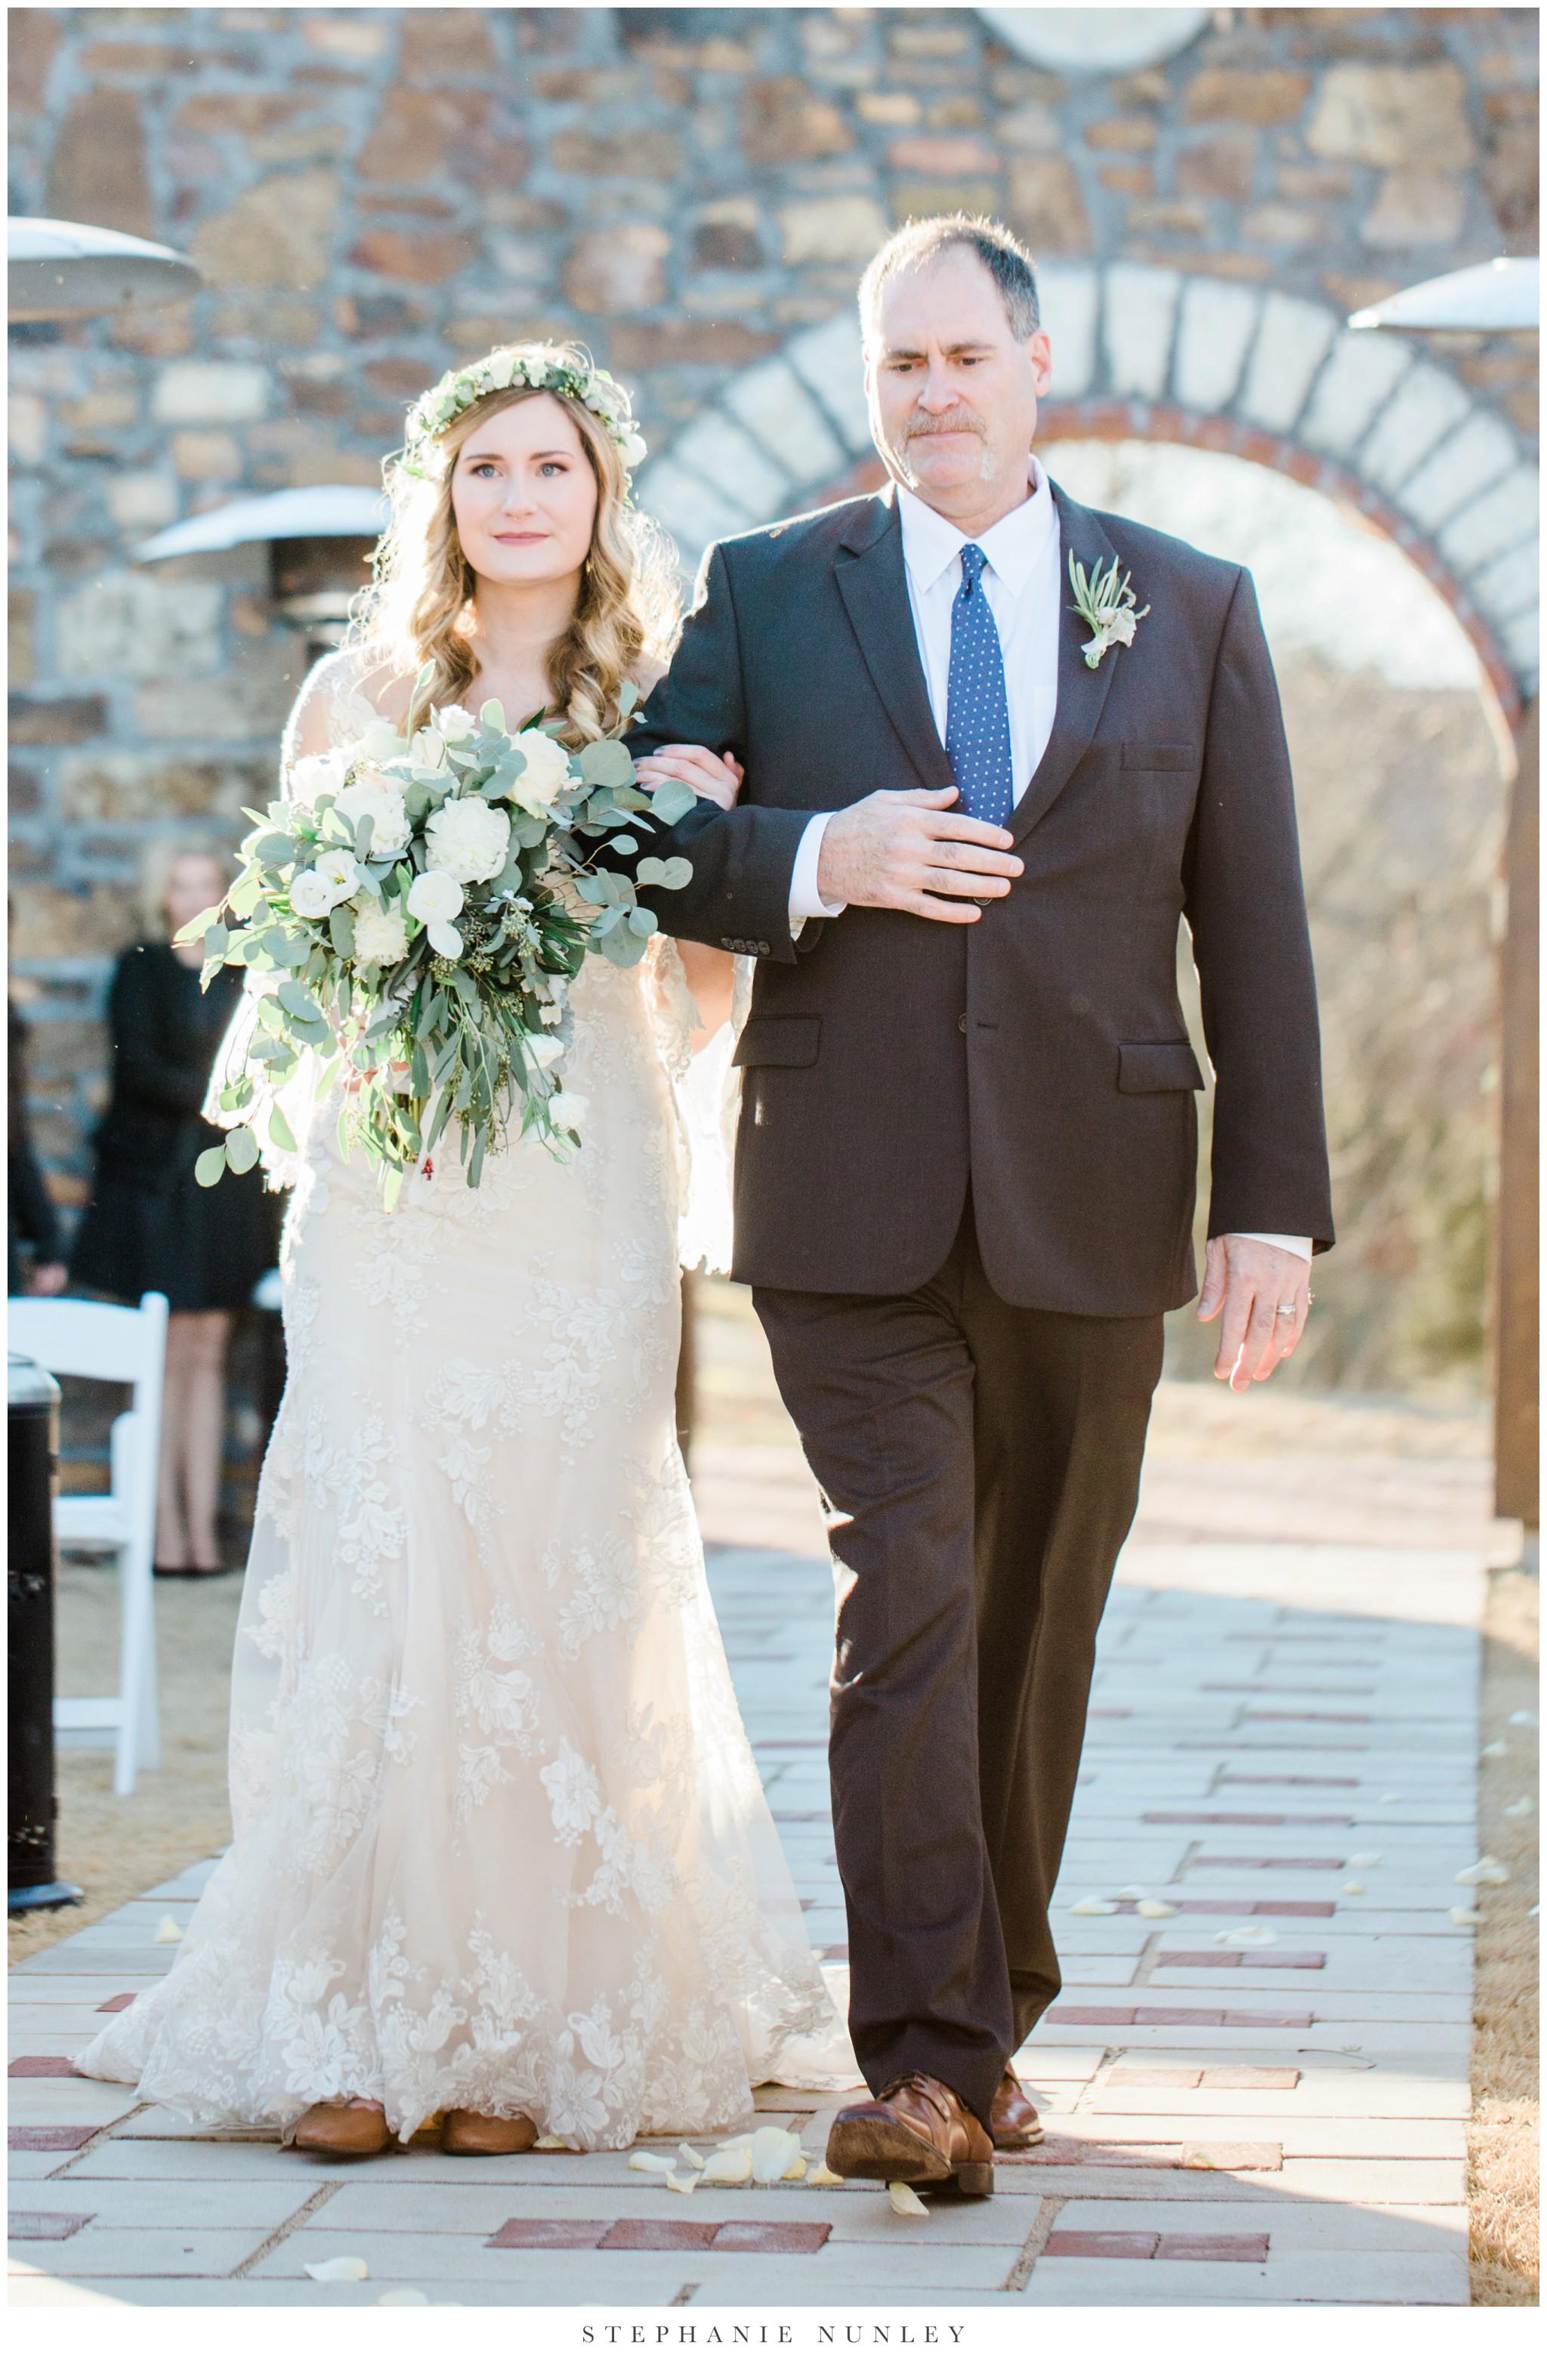 sassafrass-springs-vineyard-film-wedding-photos-59.jpg